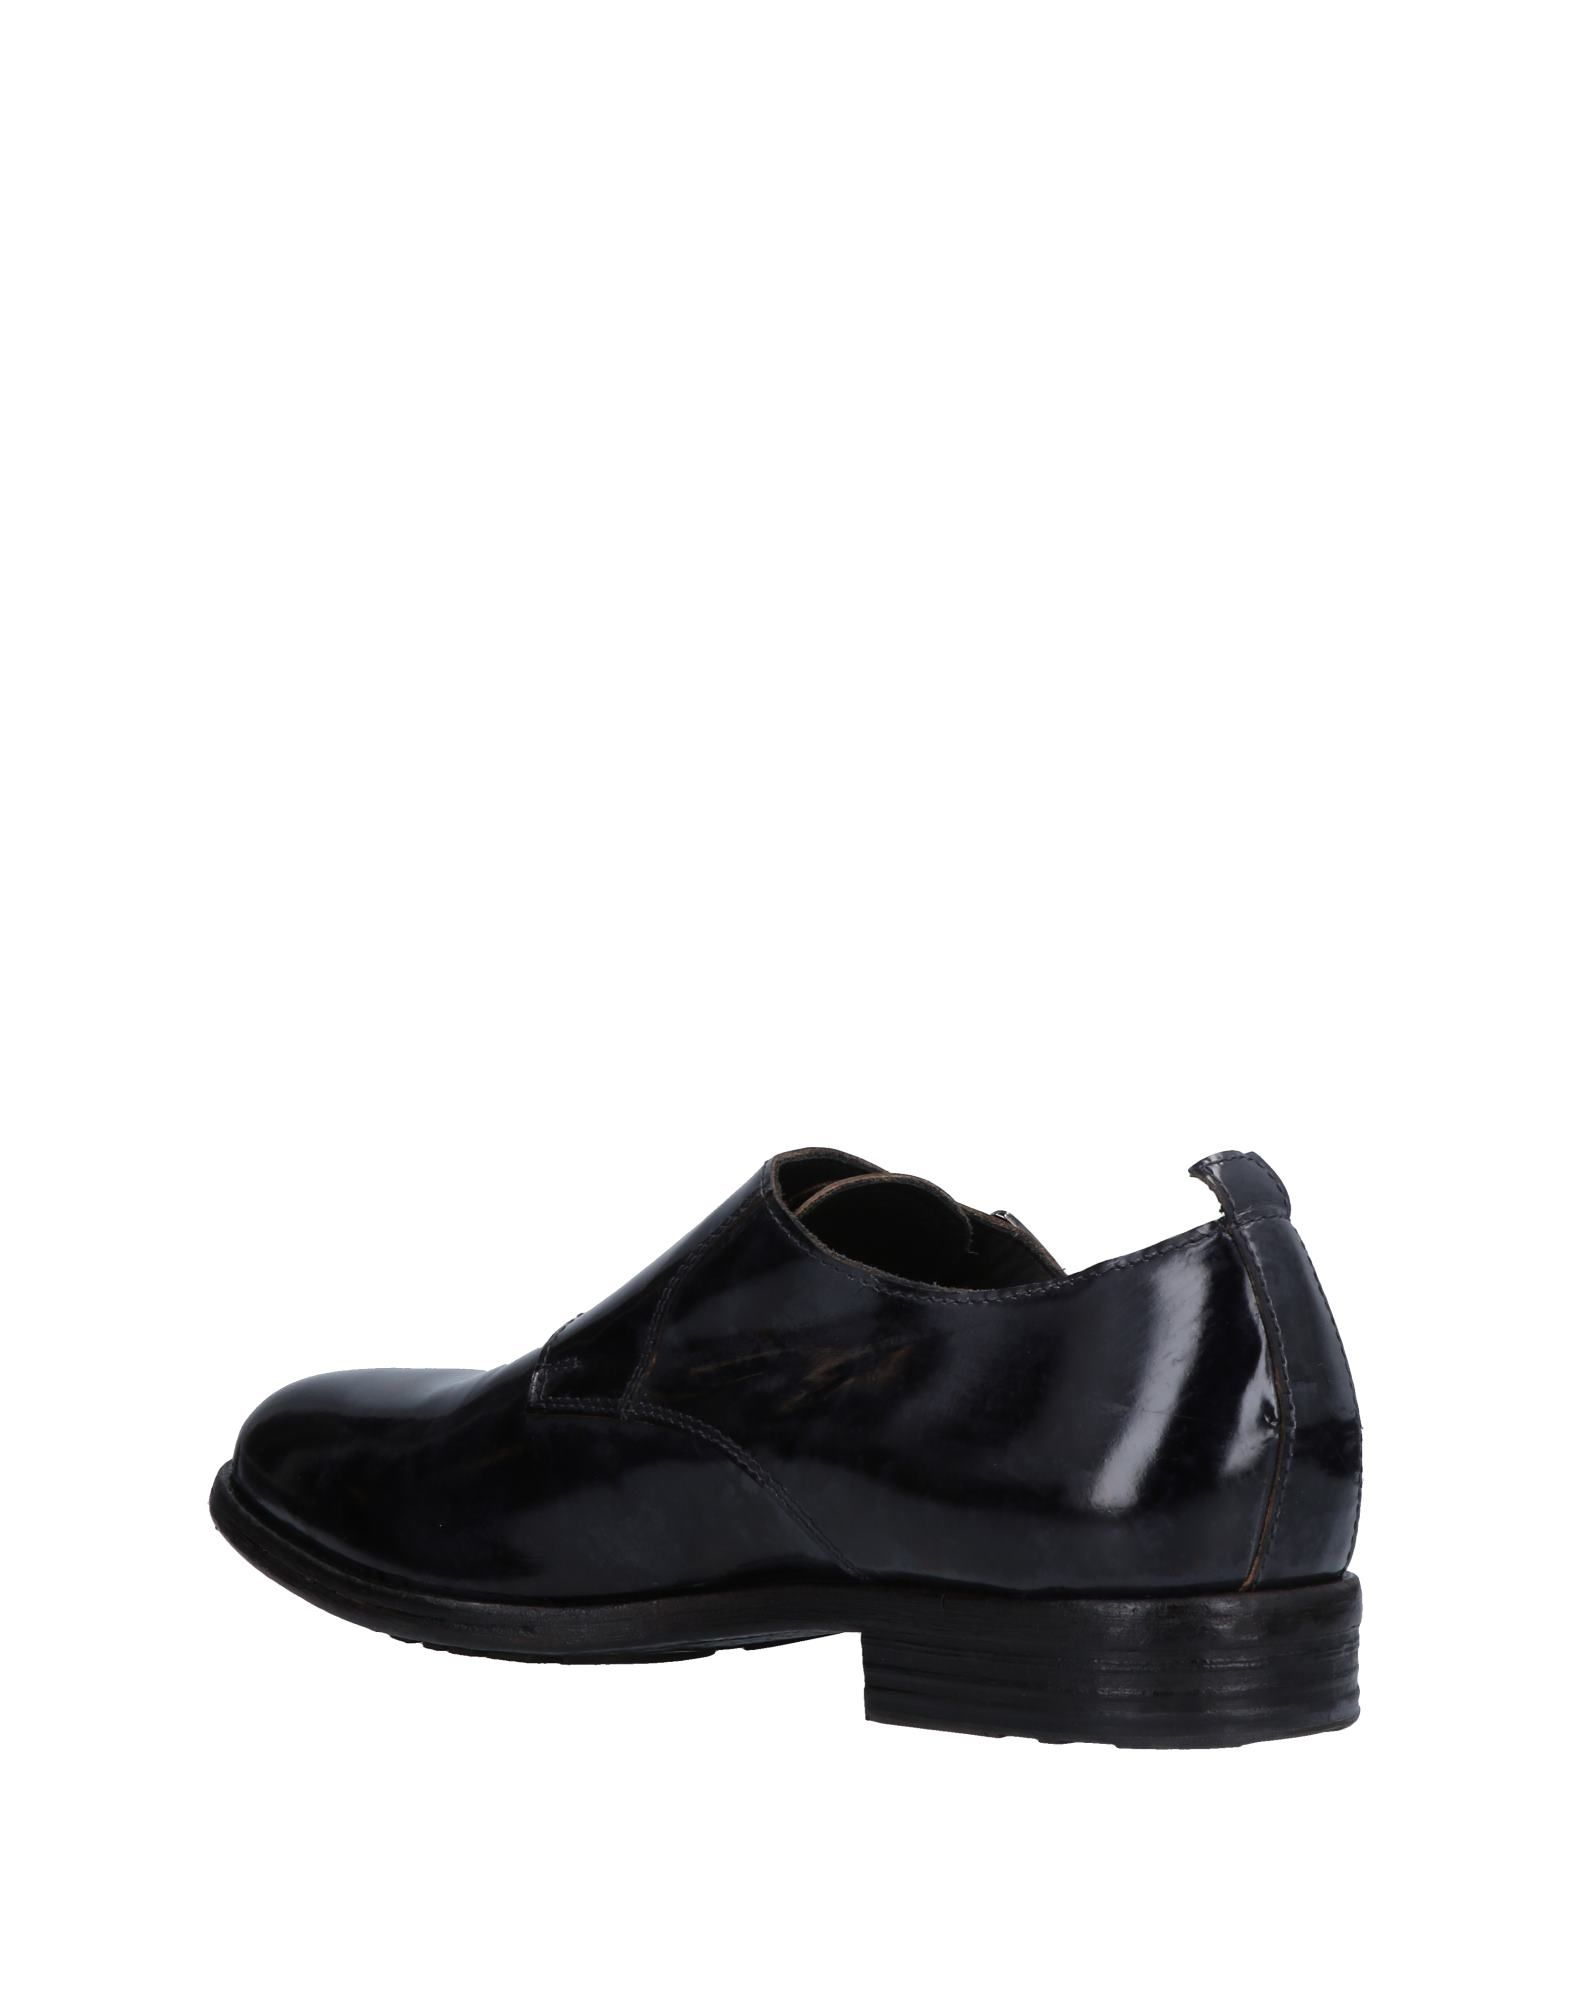 Moma Mokassins Herren  11509229MF Gute Qualität beliebte Schuhe